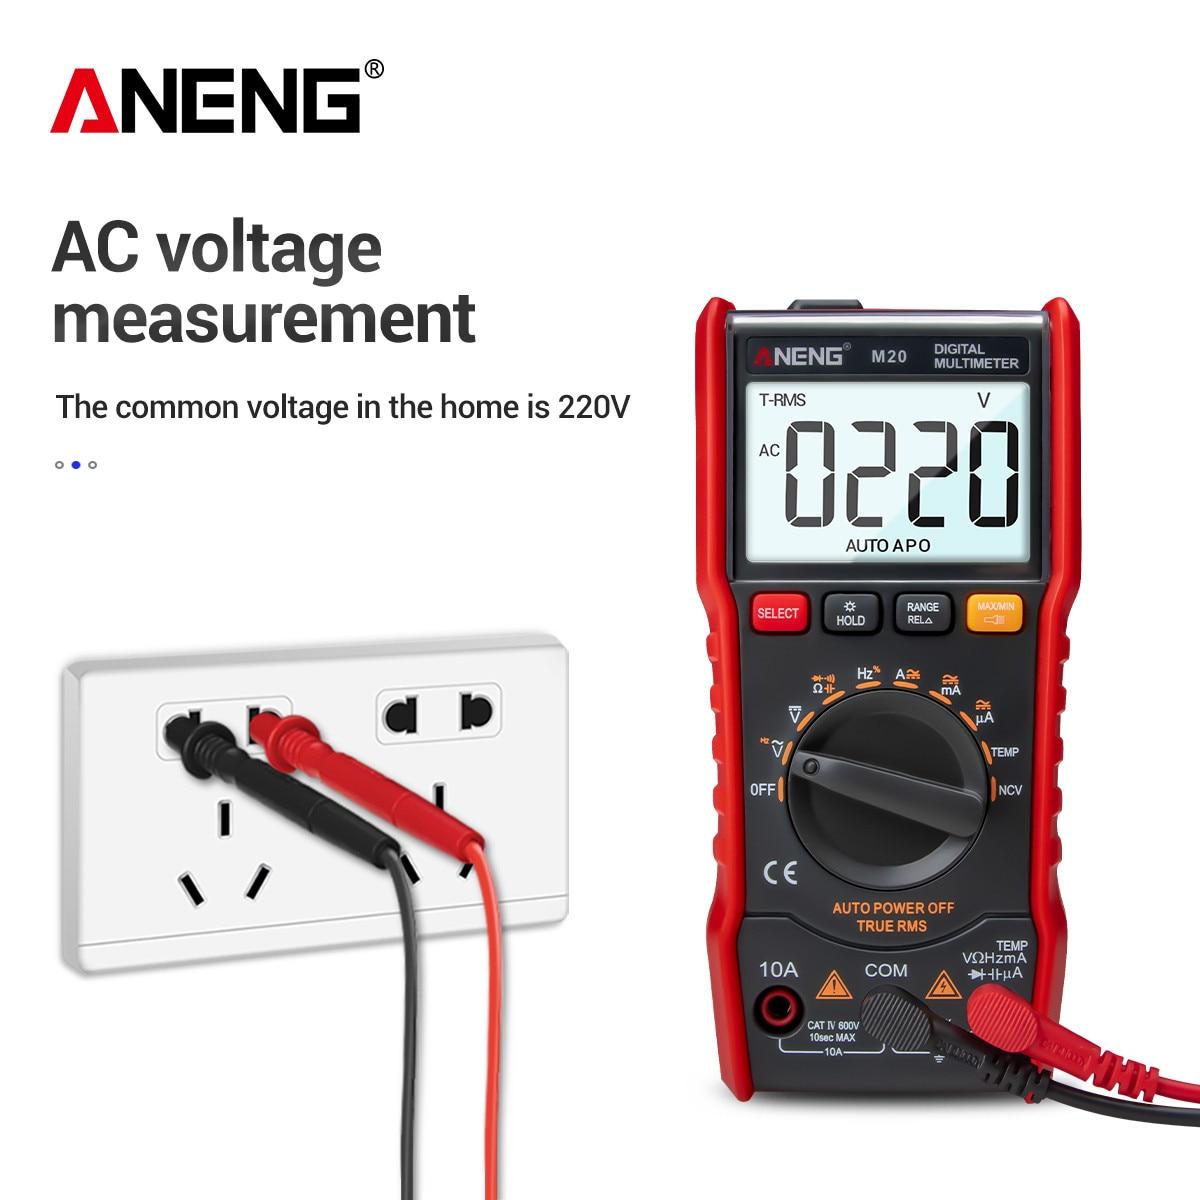 ANENG M20 Digital Pocket Multimeter Profissional 6000 Counts Transistor Tester True Rms Capacitance Esr Mutimetro Lcr Meter